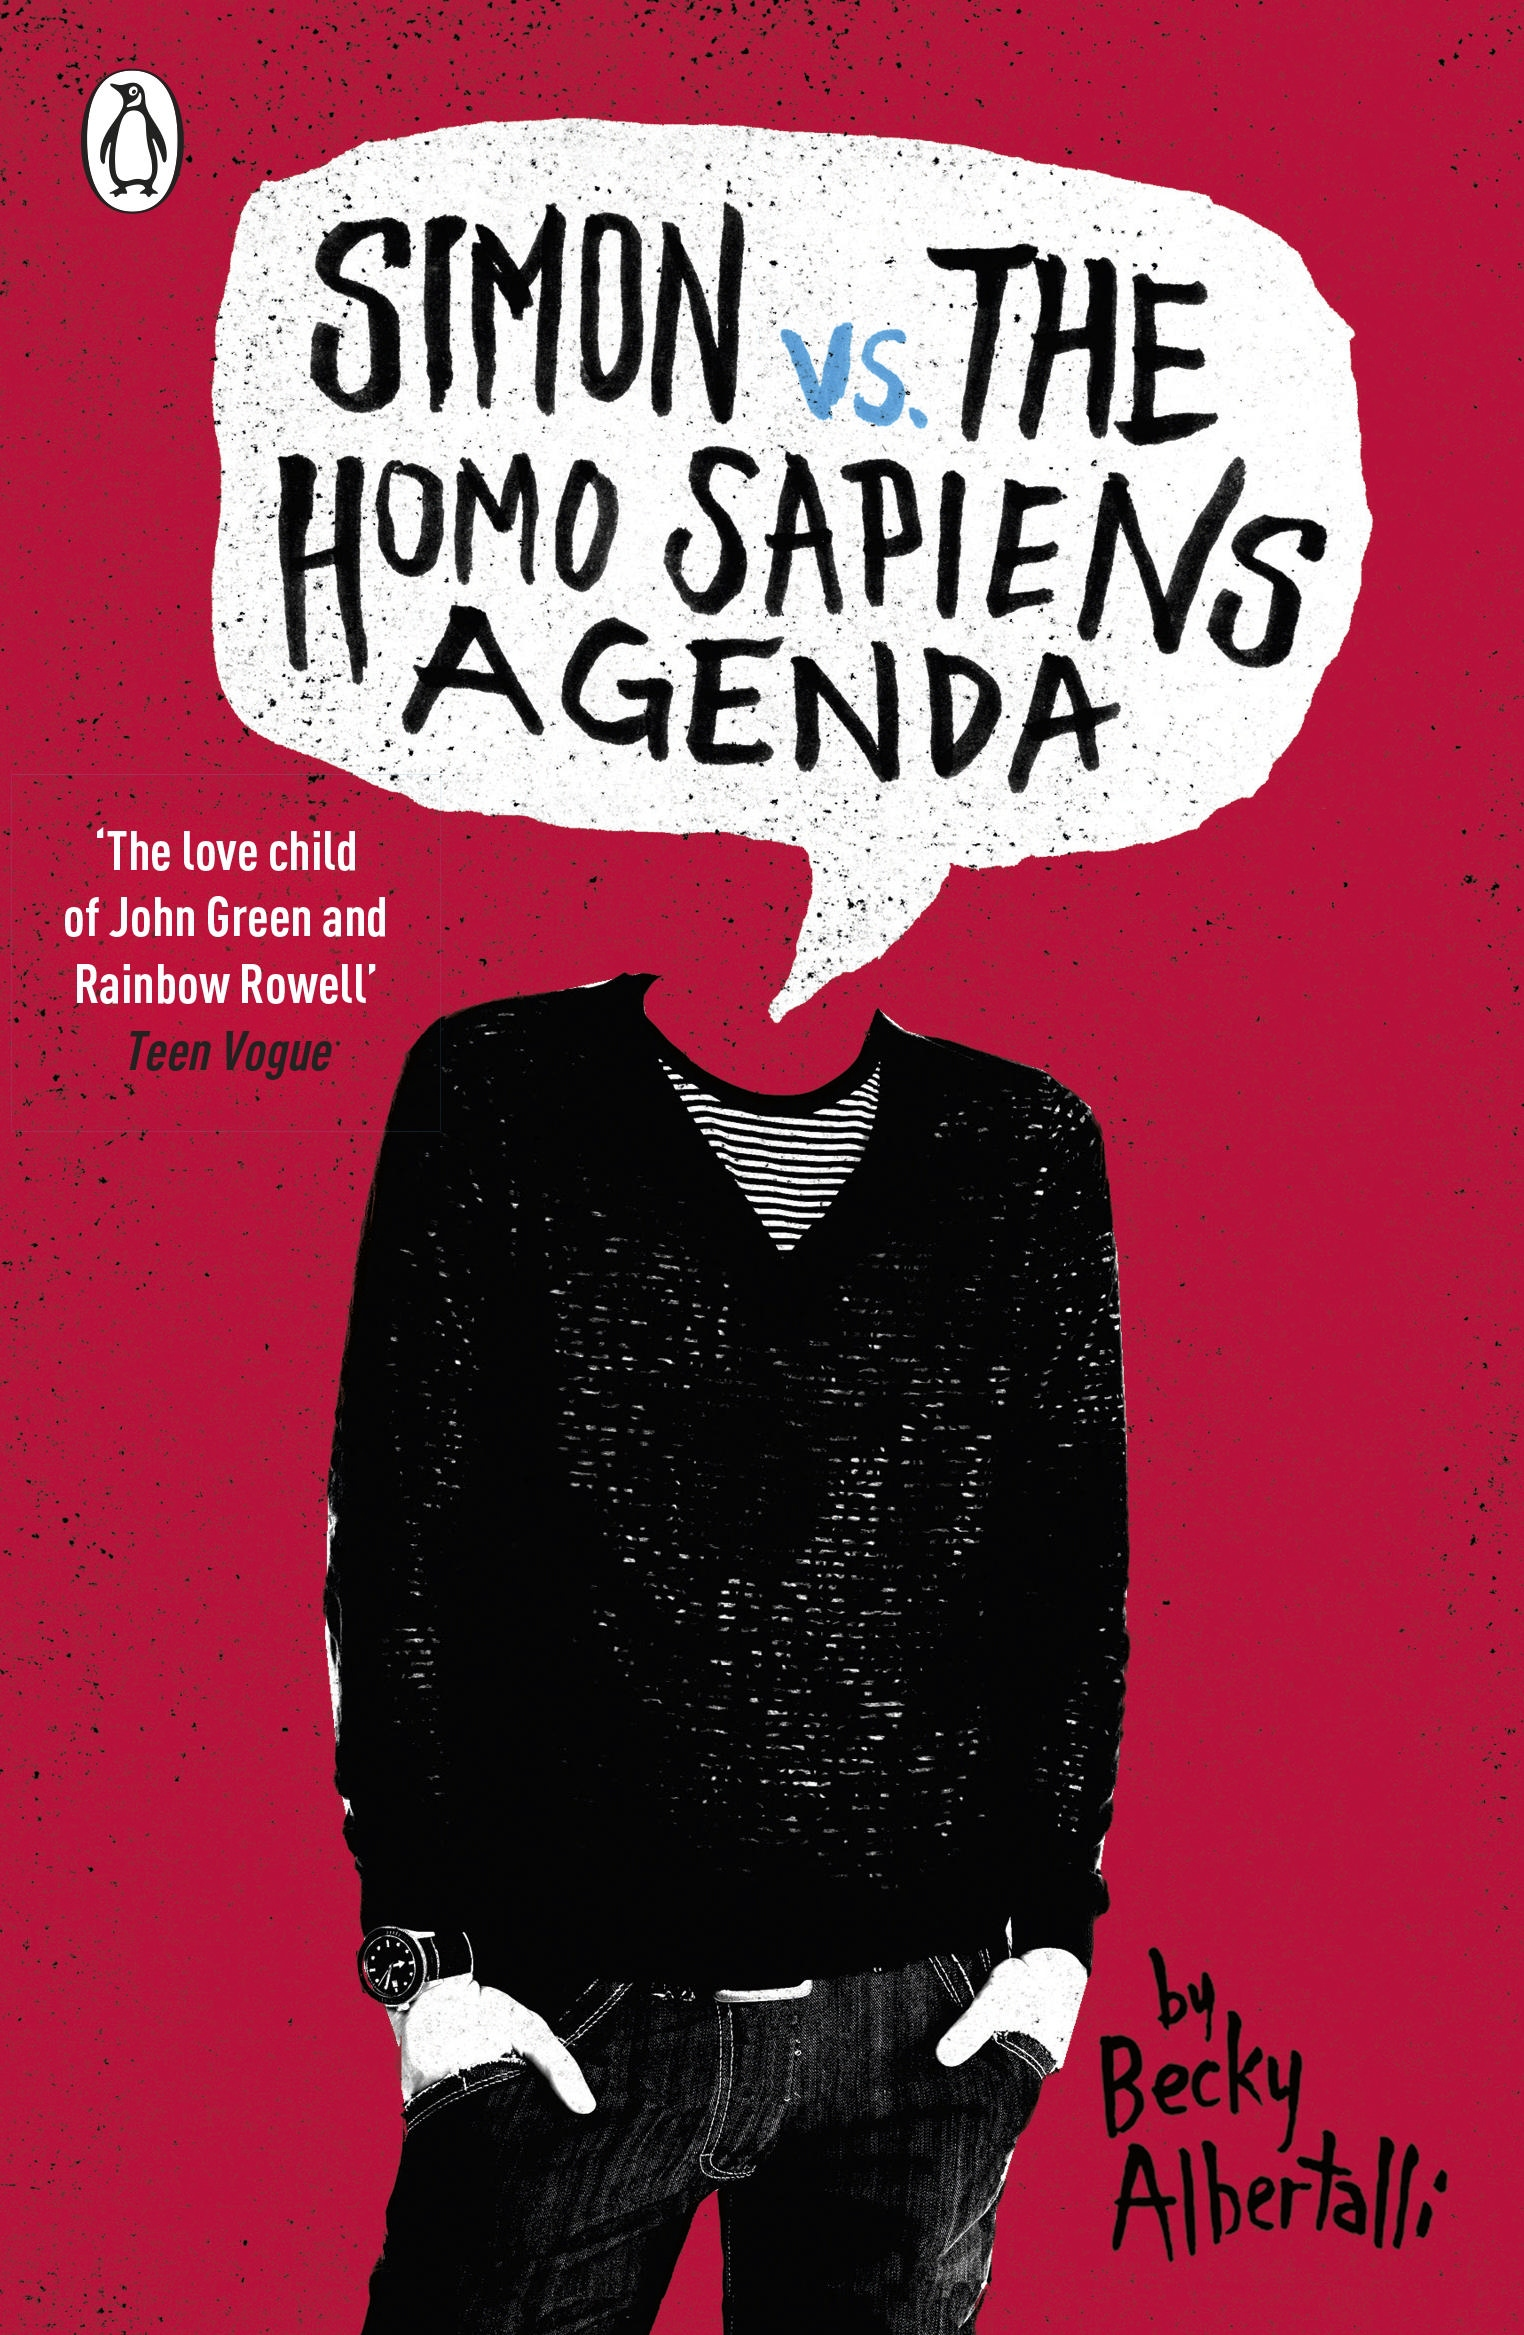 Review – Simon vs. the Homo Sapiens Agenda by Becky Albertalli